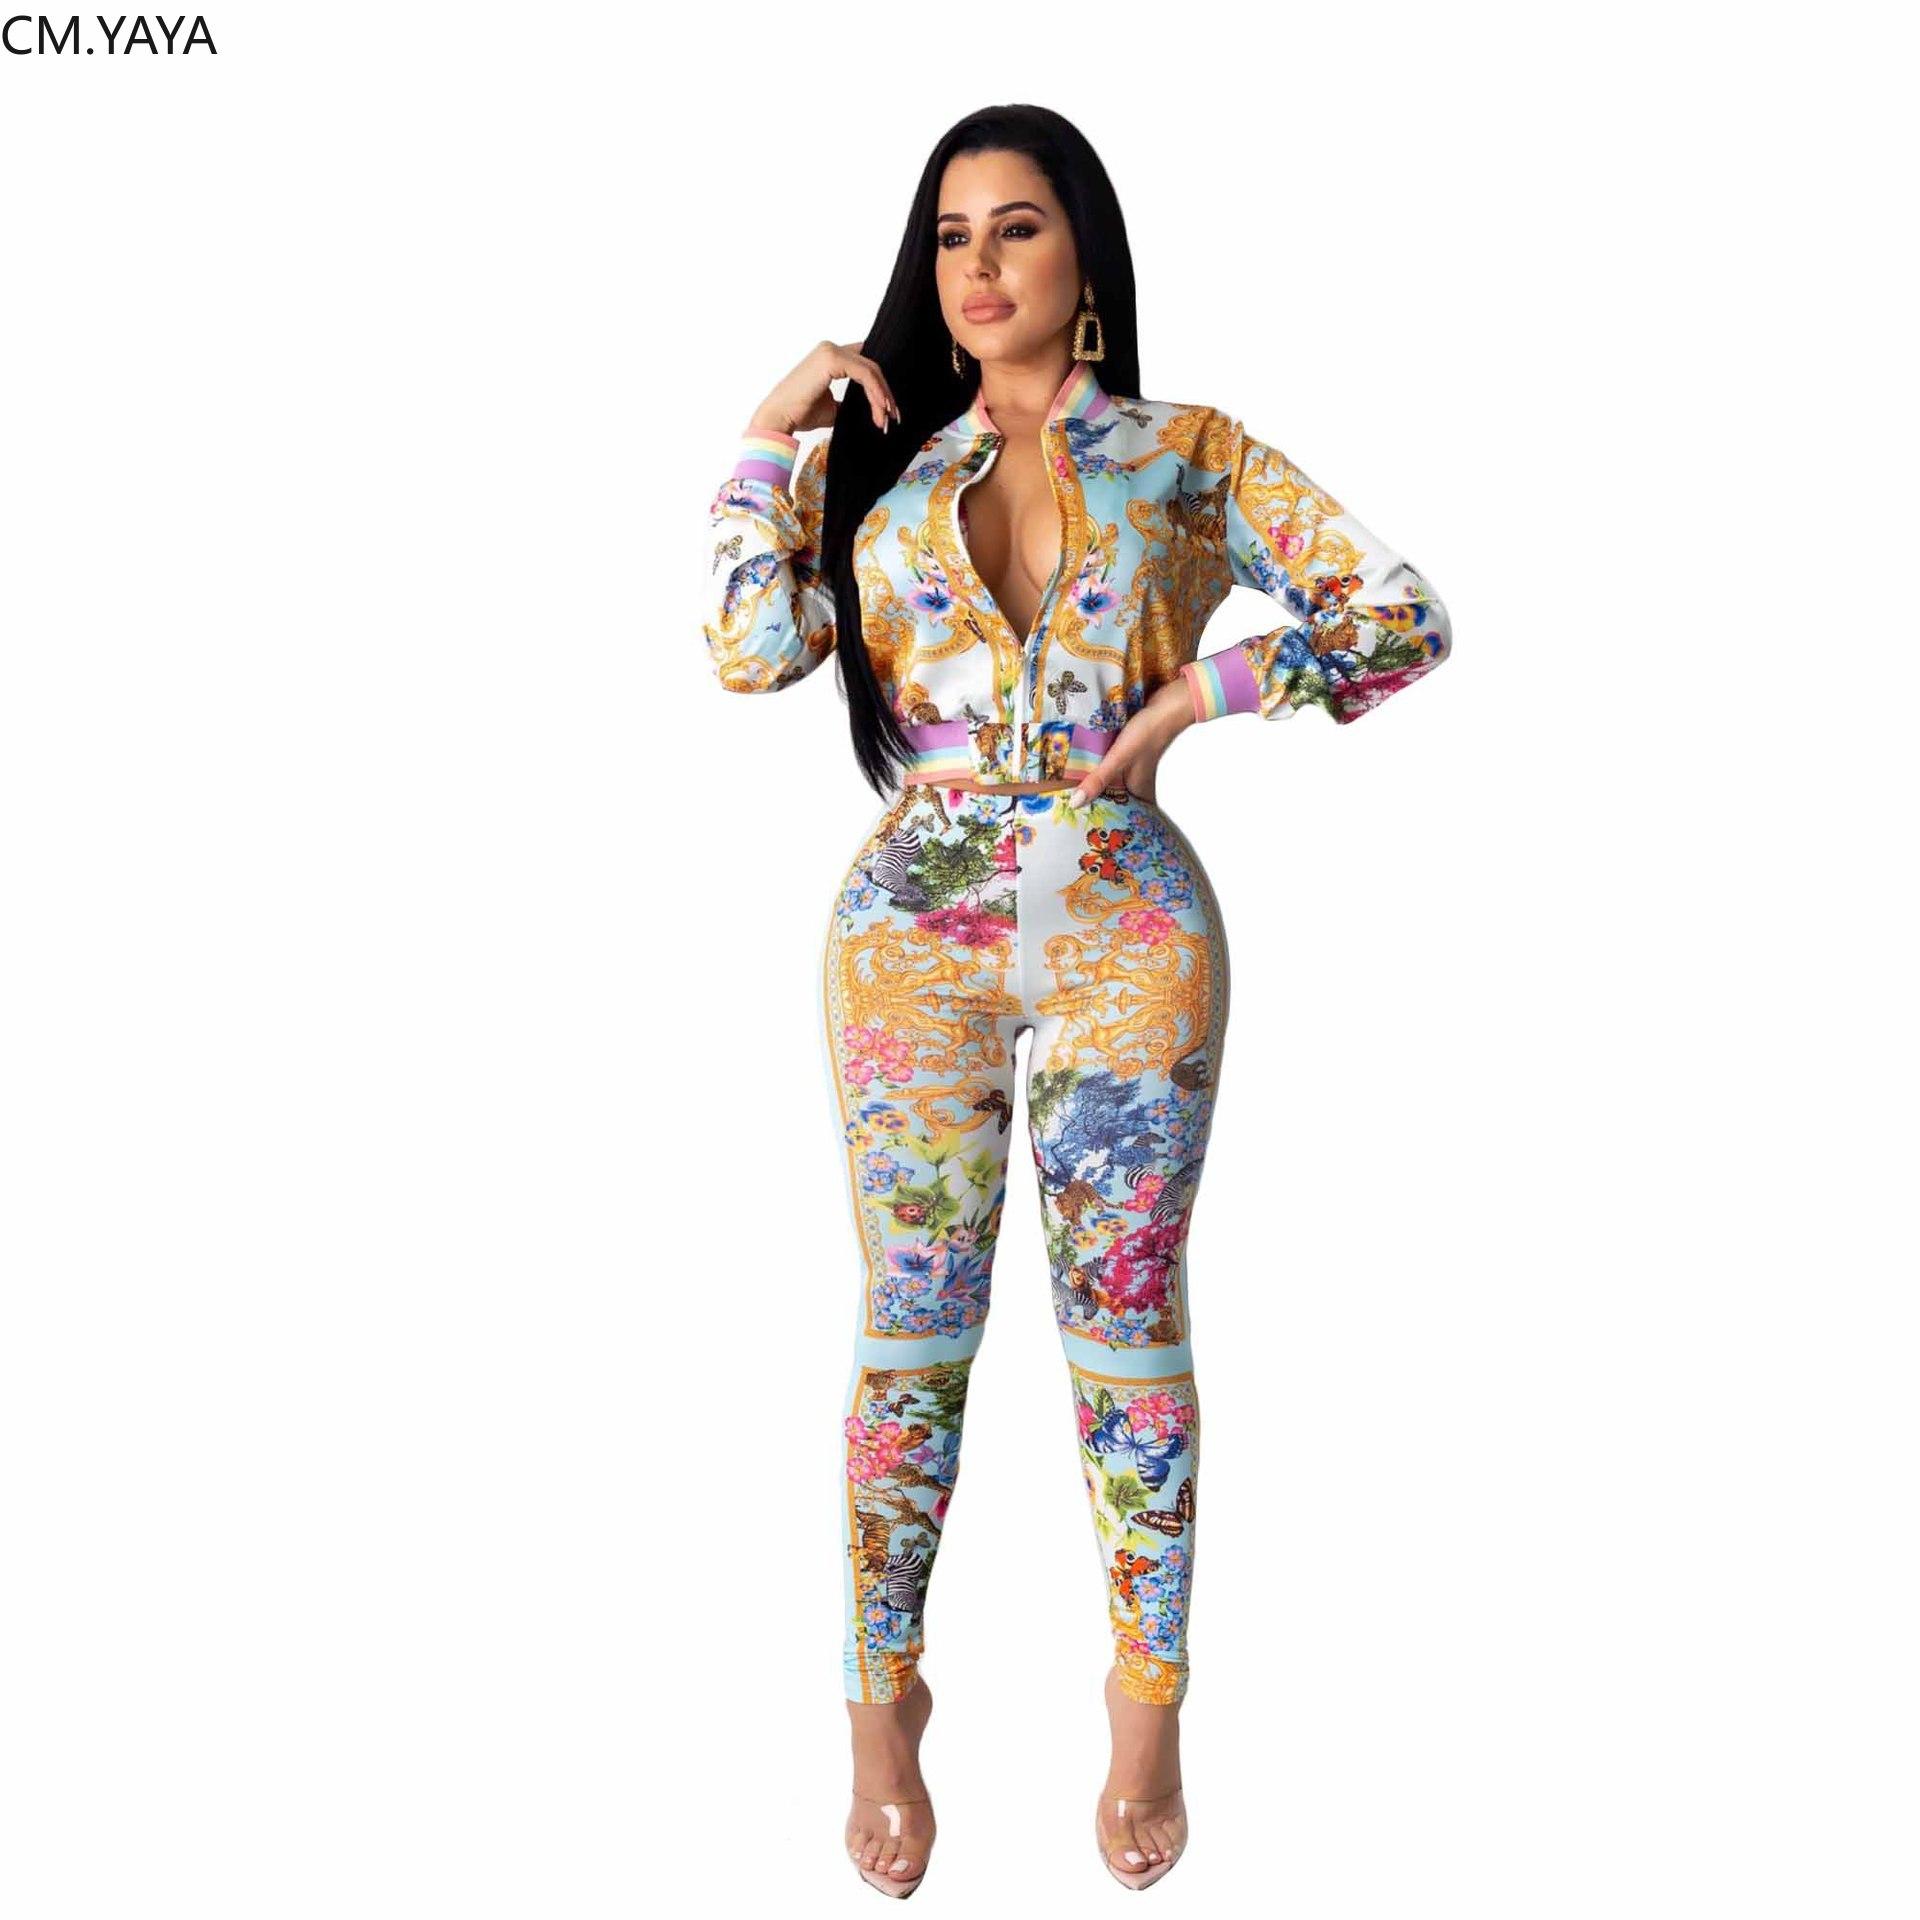 2020 Winter Frauen Sets Volle Sleeve Zipper Top Hosen Anzüge Bunte Drucken Zwei Stück Set Casual Trainingsanzüge Fitness Outfits GL1999